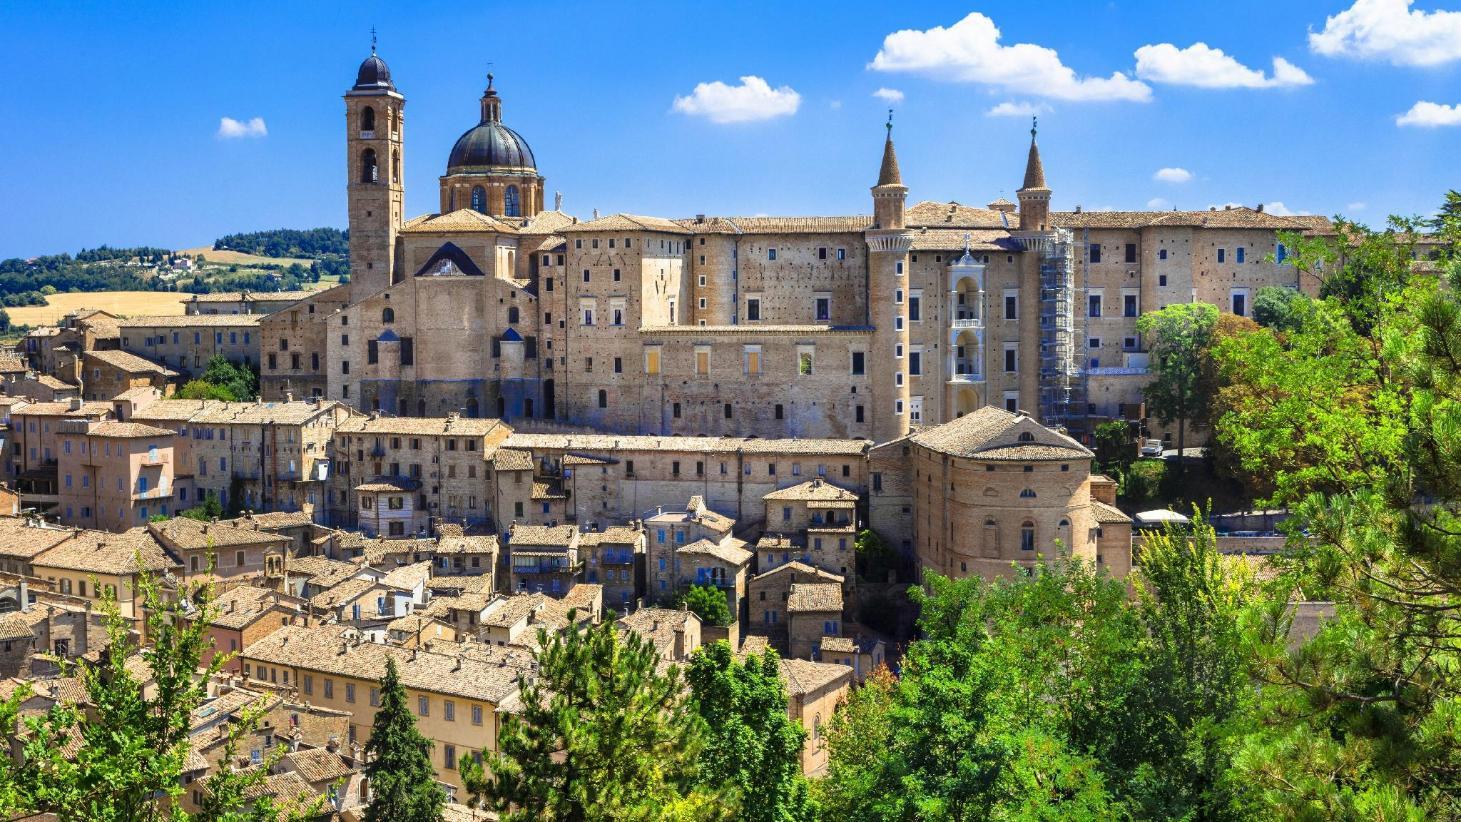 Urbino Apartments - Best Price + HD Photos of Apartments in Urbino